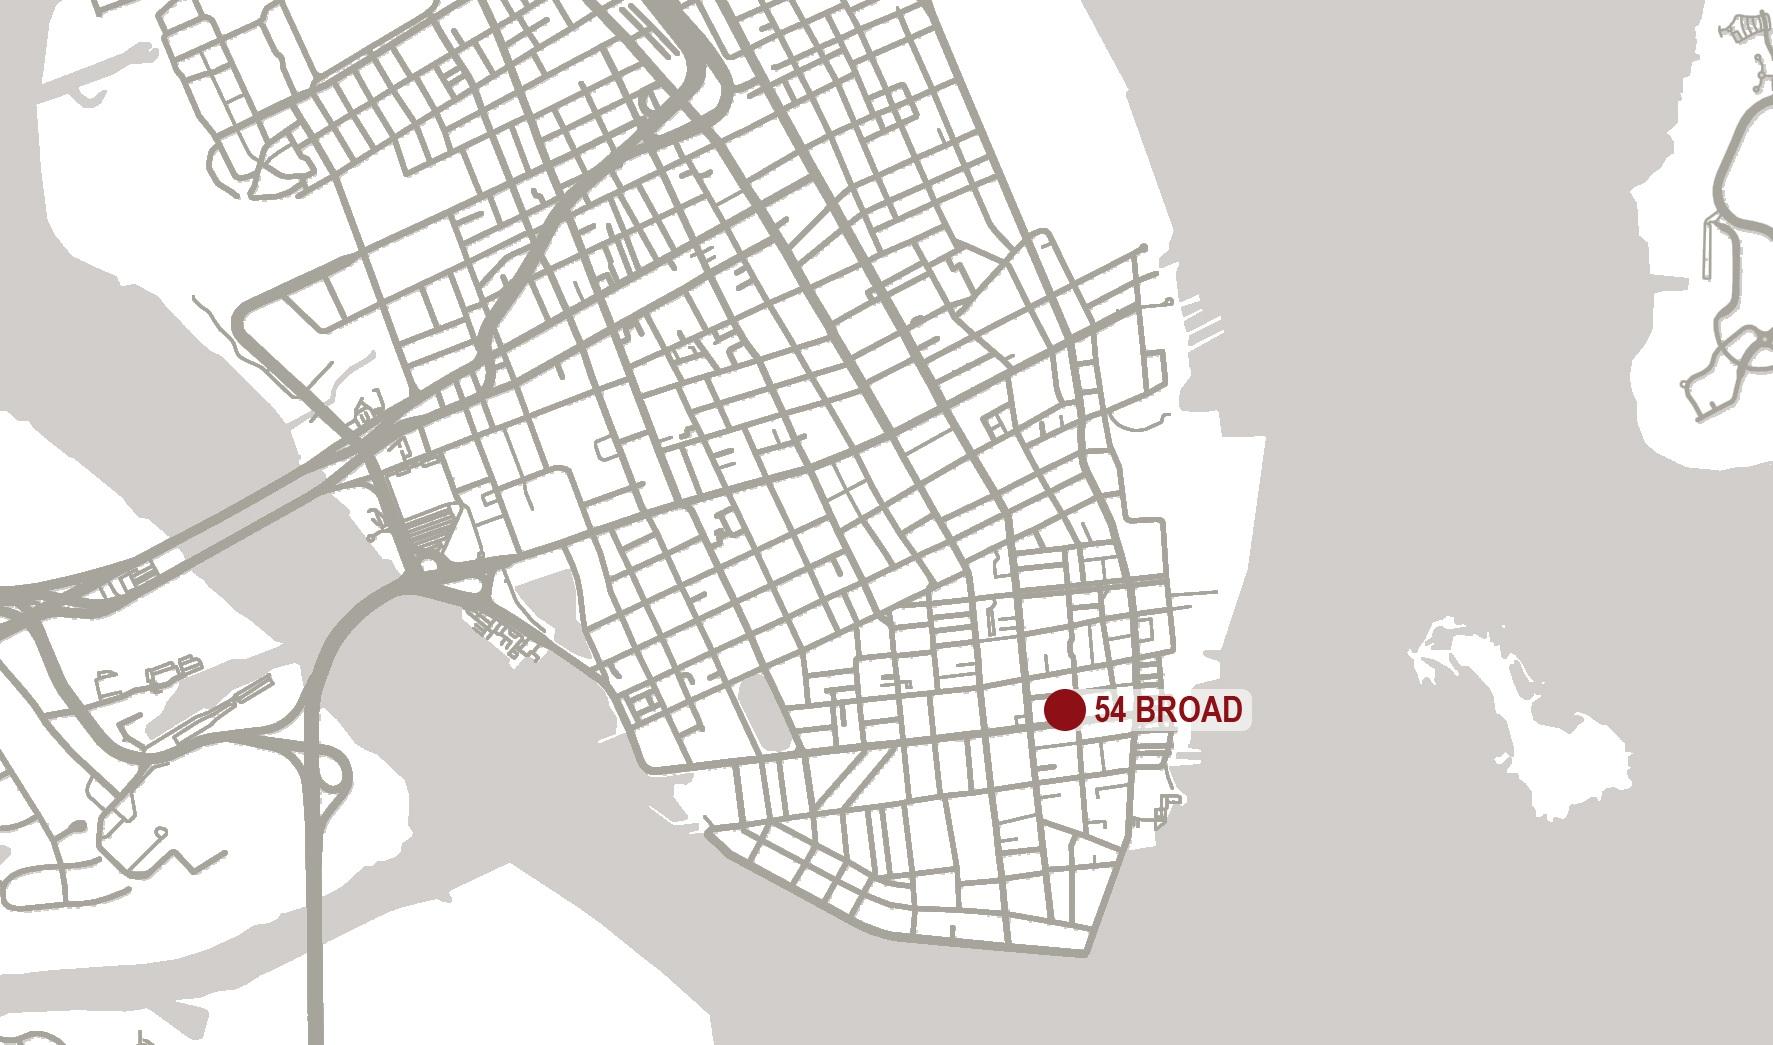 map+cropped+2.jpg